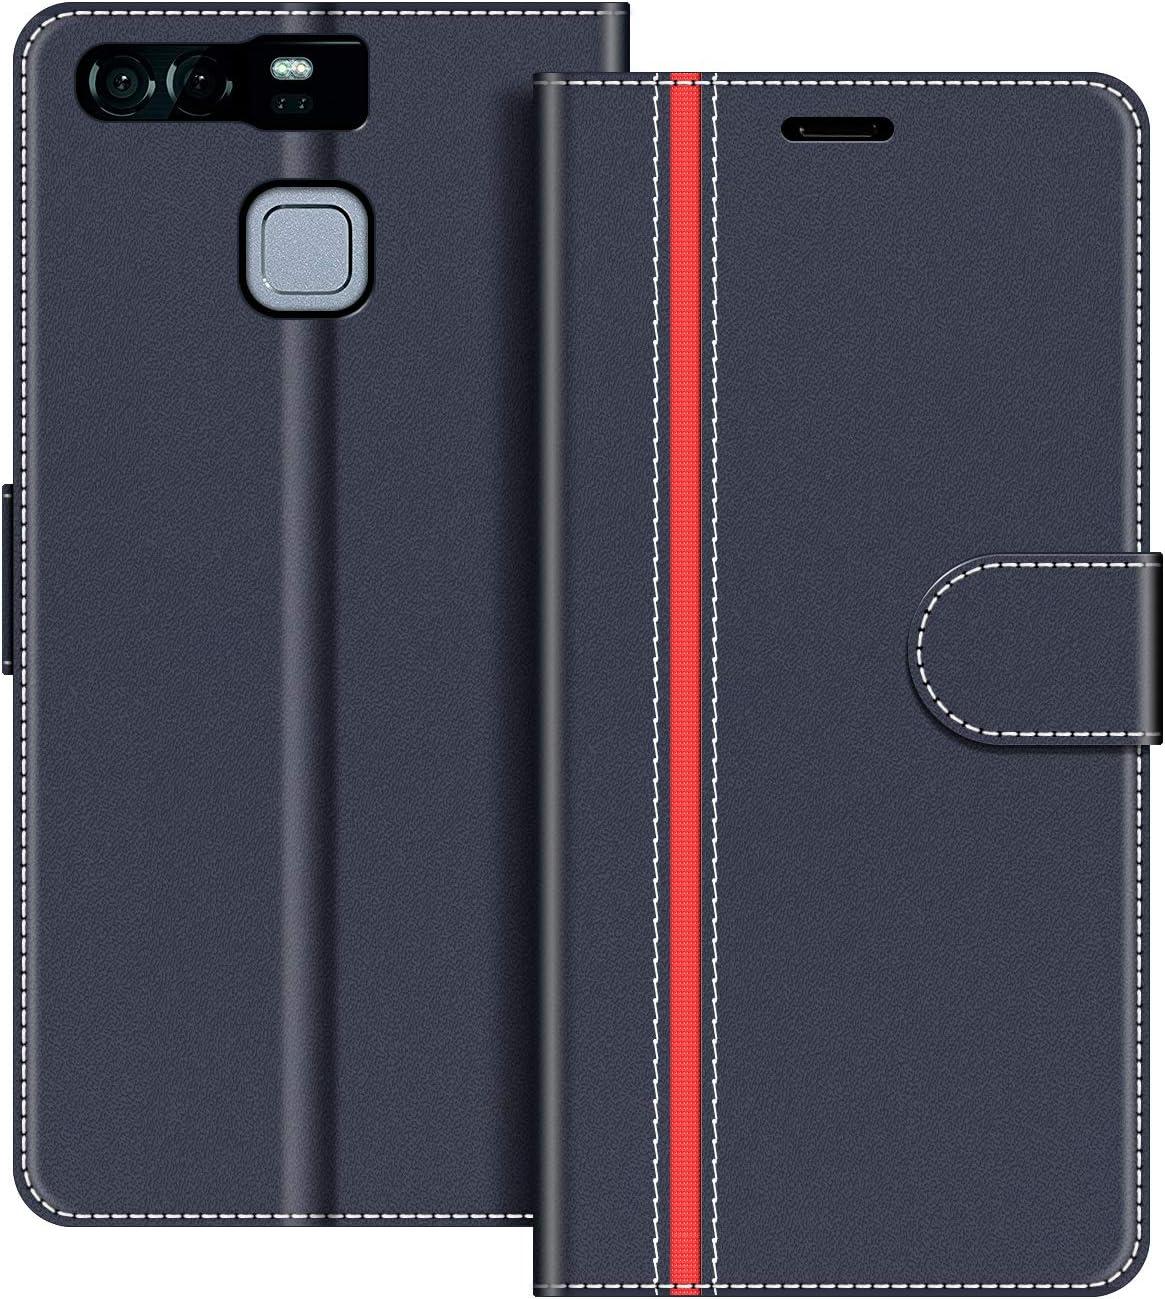 COODIO Funda Huawei P9 con Tapa, Funda Movil Huawei P9, Funda Libro Huawei P9 Carcasa Magnético Funda para Huawei P9, Azul Oscuro/Rojo: Amazon.es: Electrónica